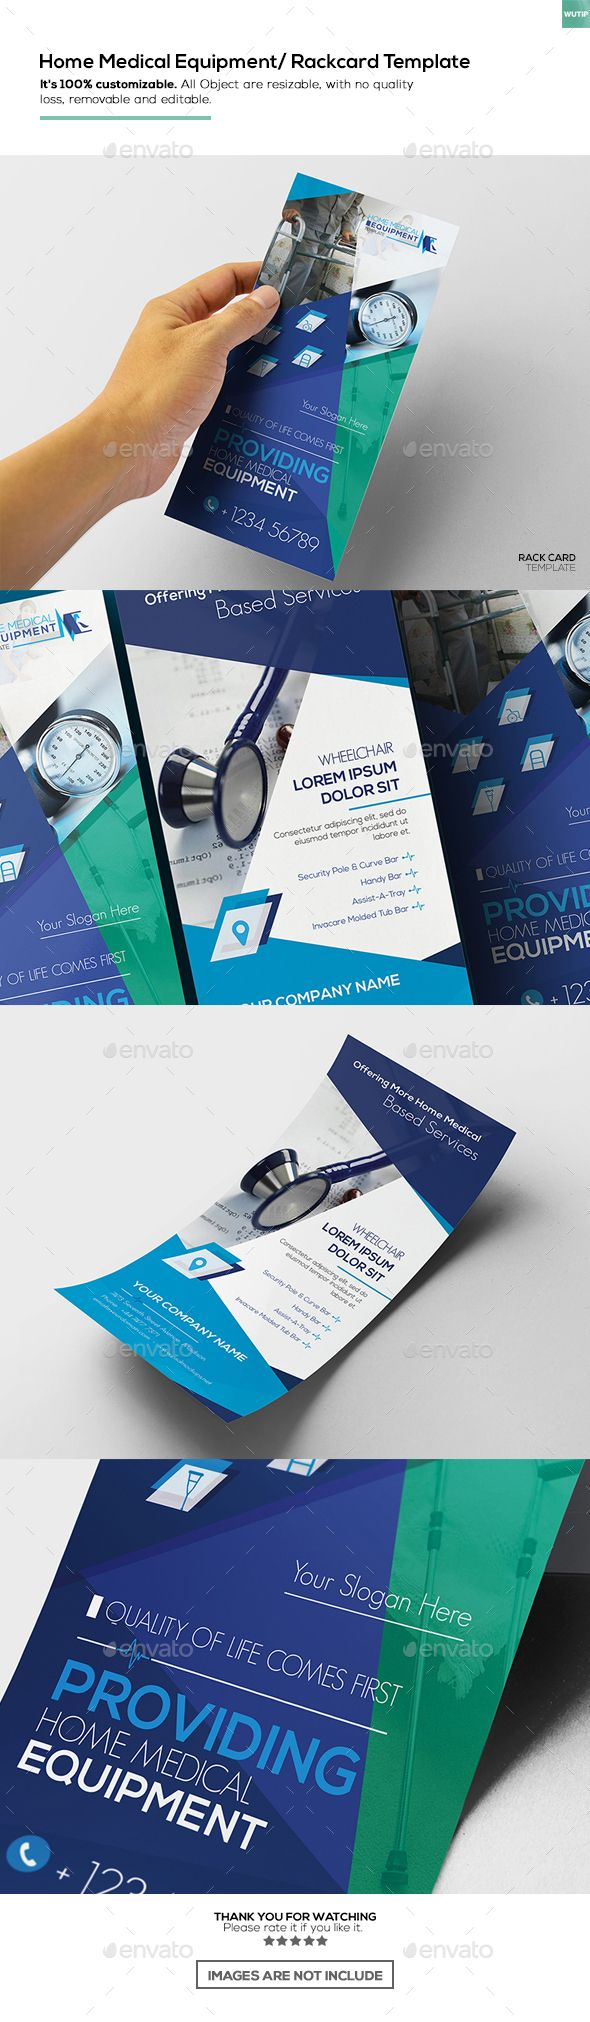 Best Medicine Flyer Print Templates PSD Images On - Print brochure templates